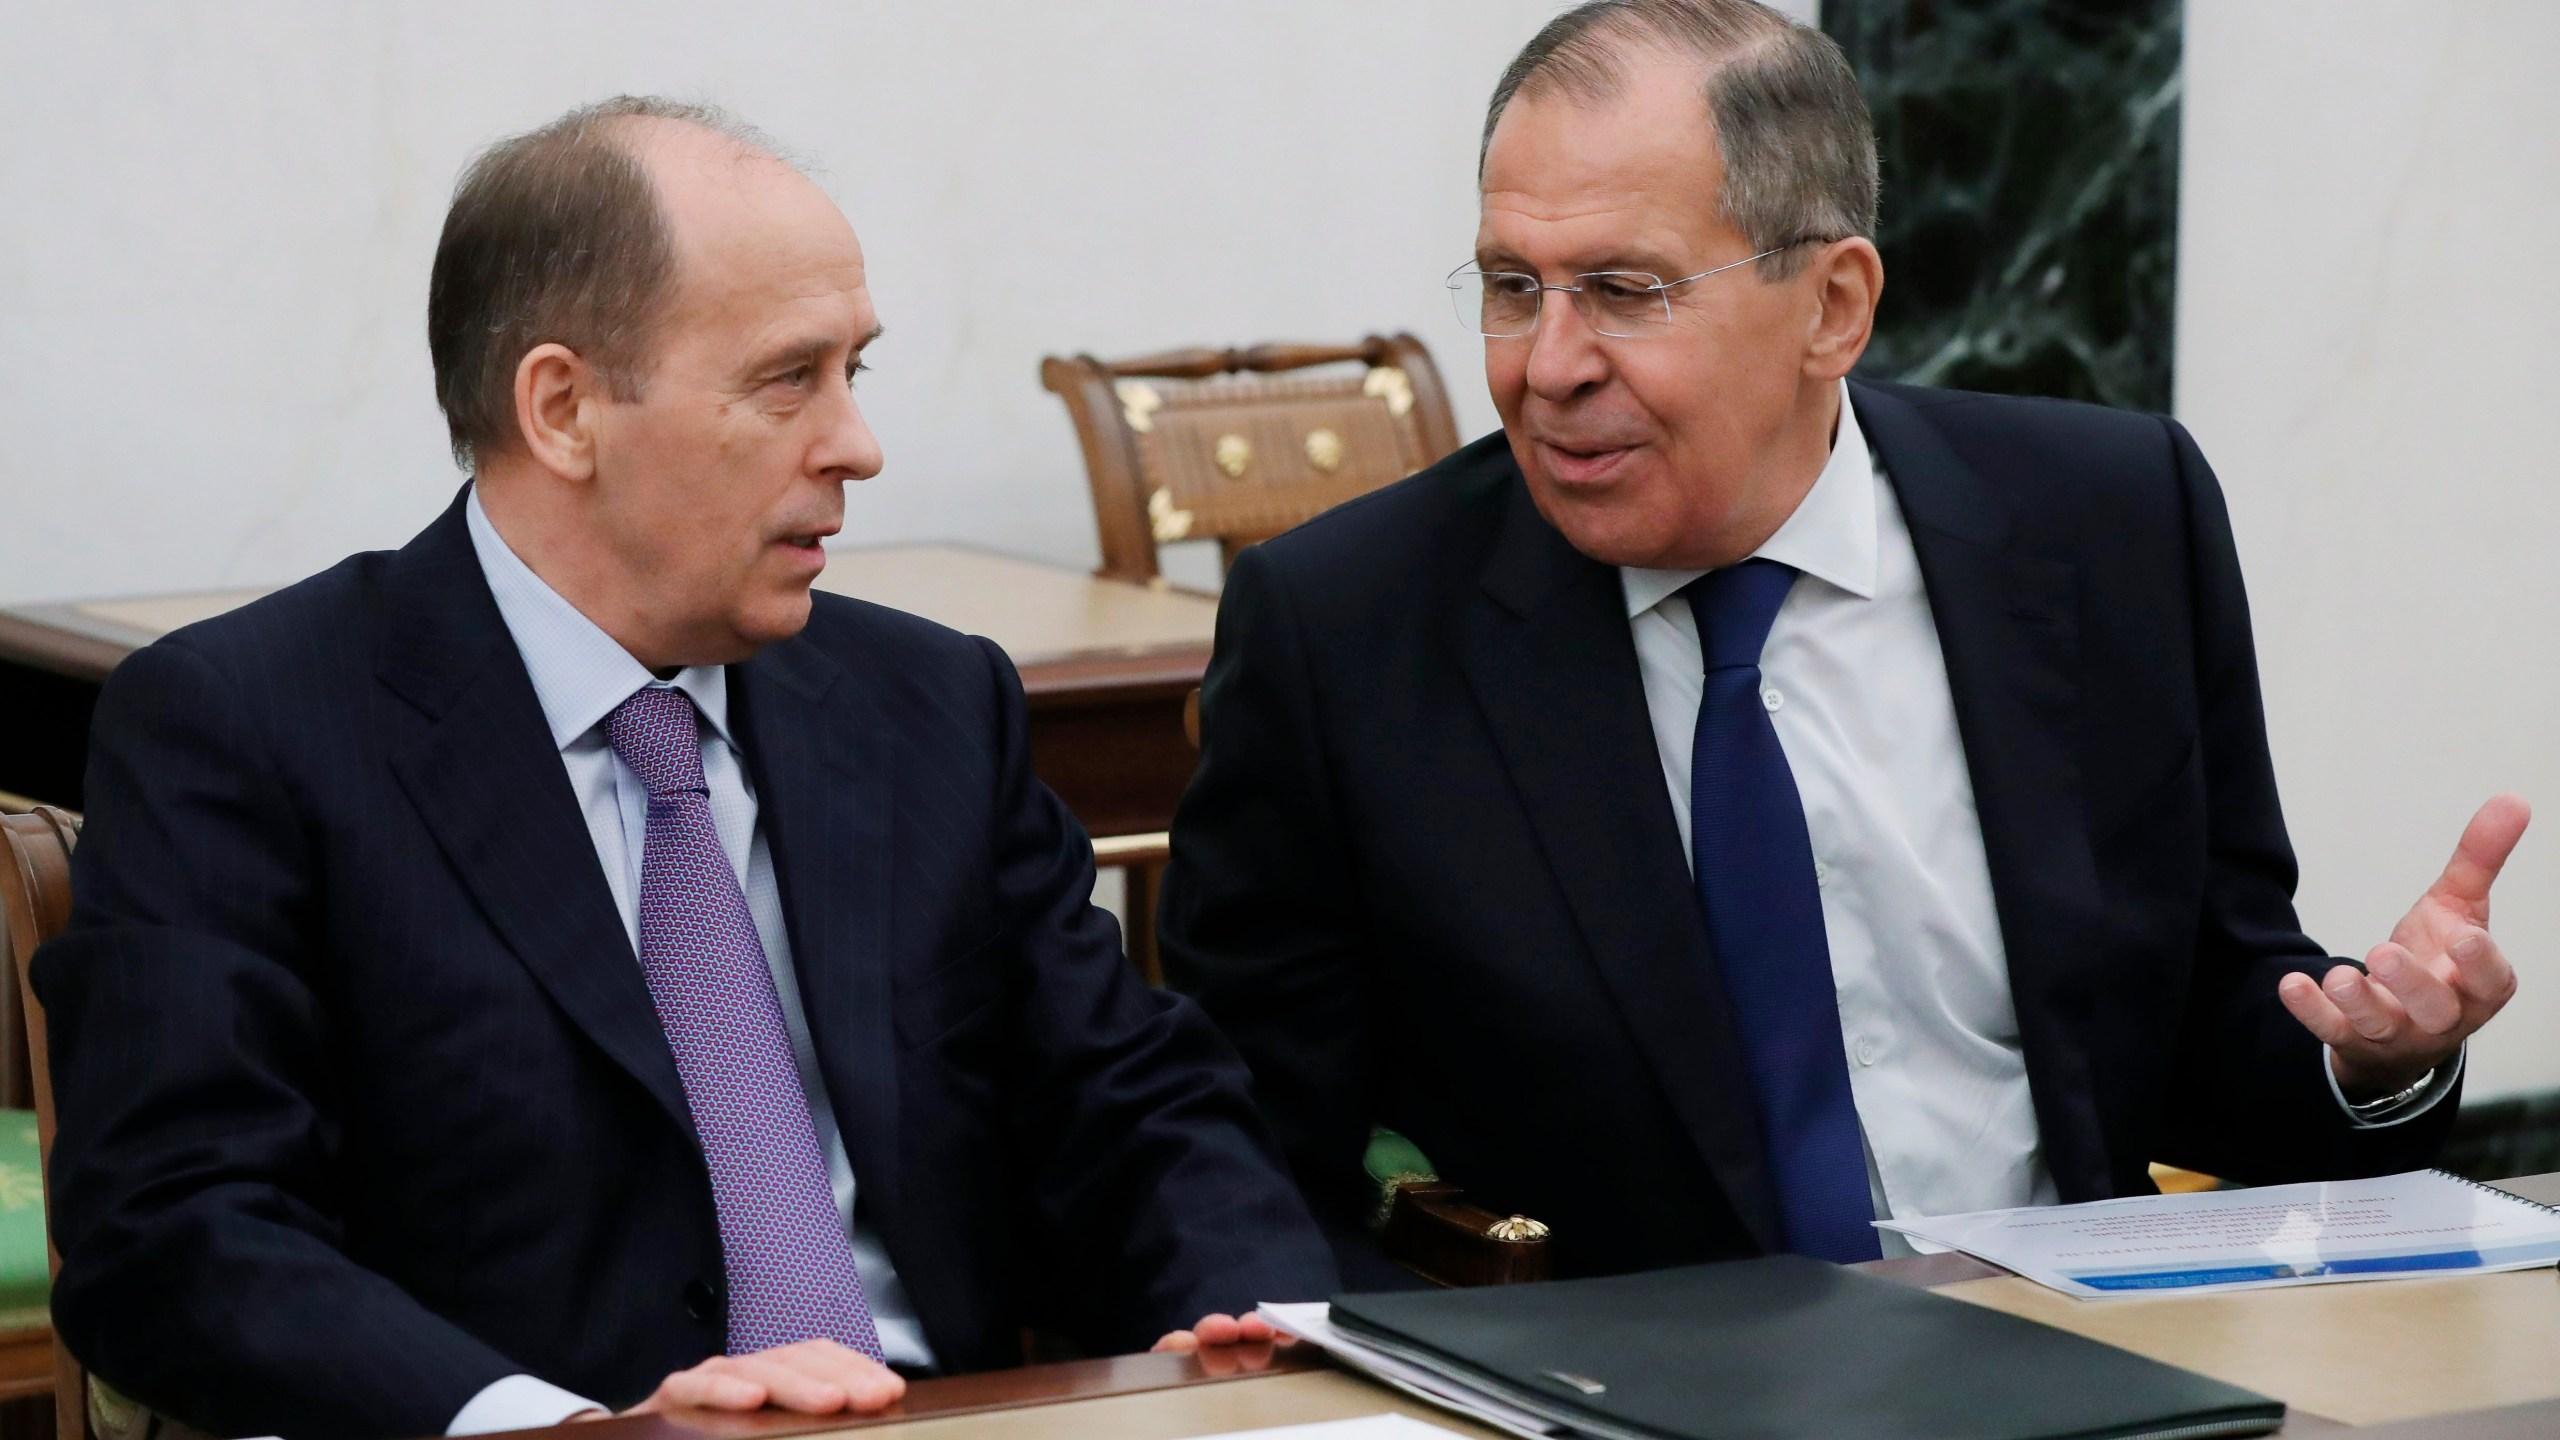 Russia_Britain_Spy_46139-159532.jpg30118453